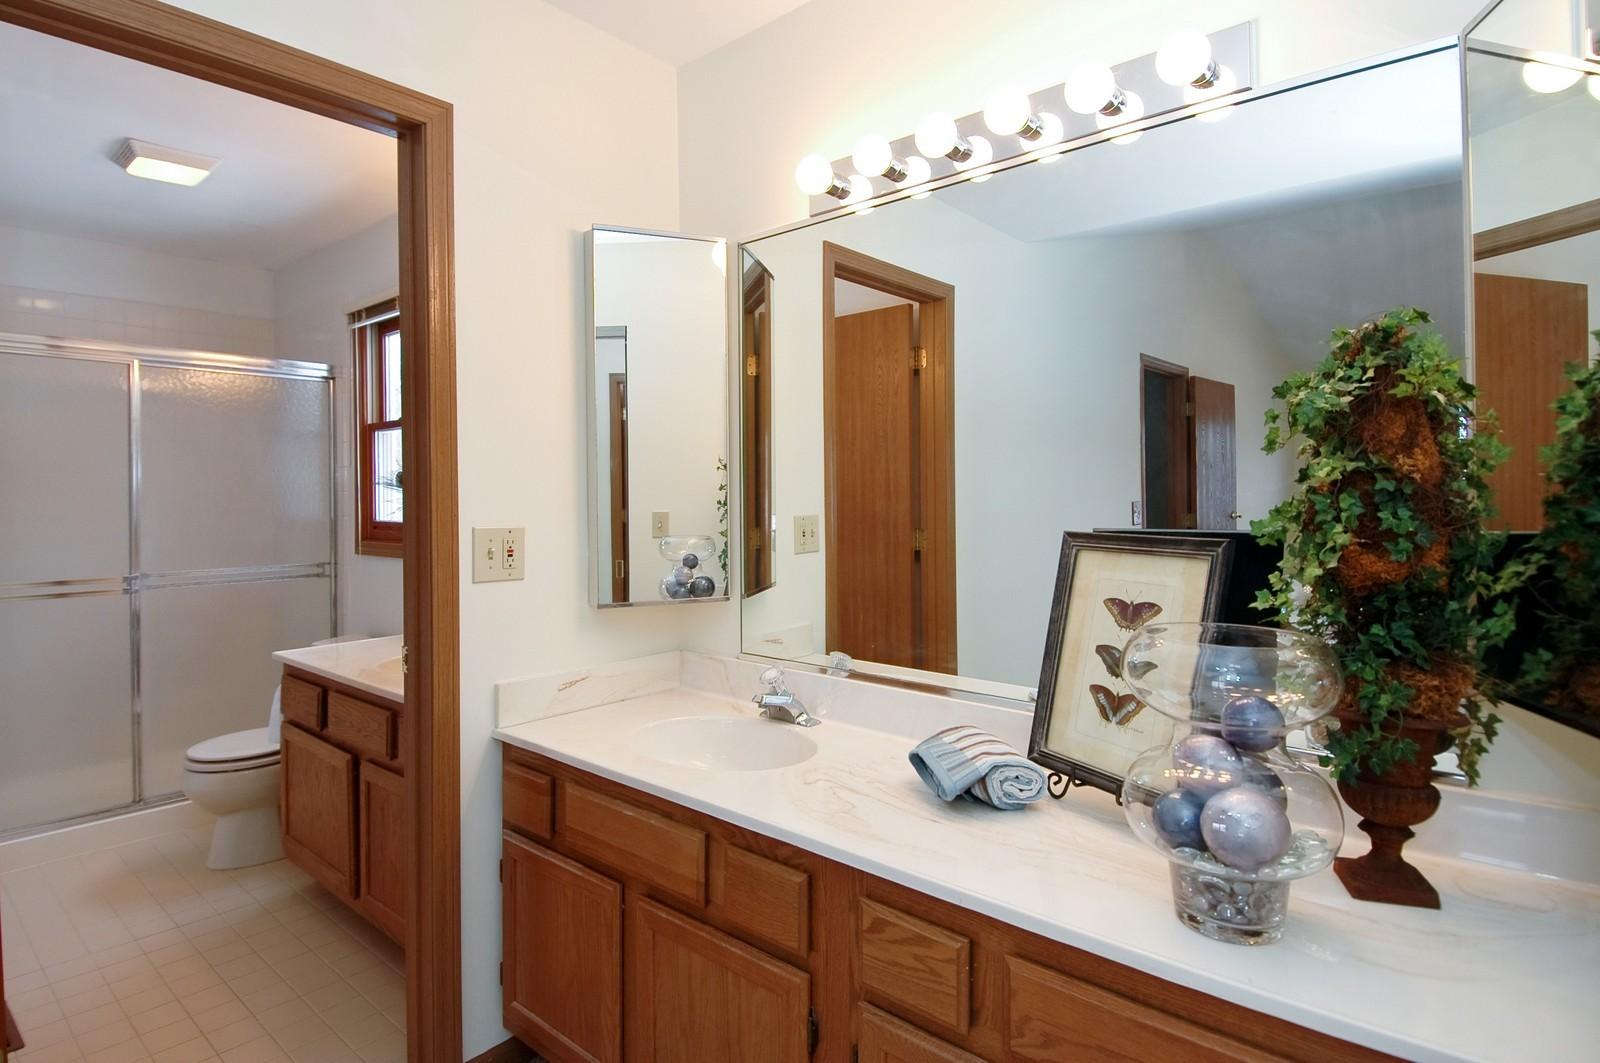 Real Estate Photography - 62 Crystal Ridge Dr, Crystal Lake, IL, 60012 - Master Bathroom